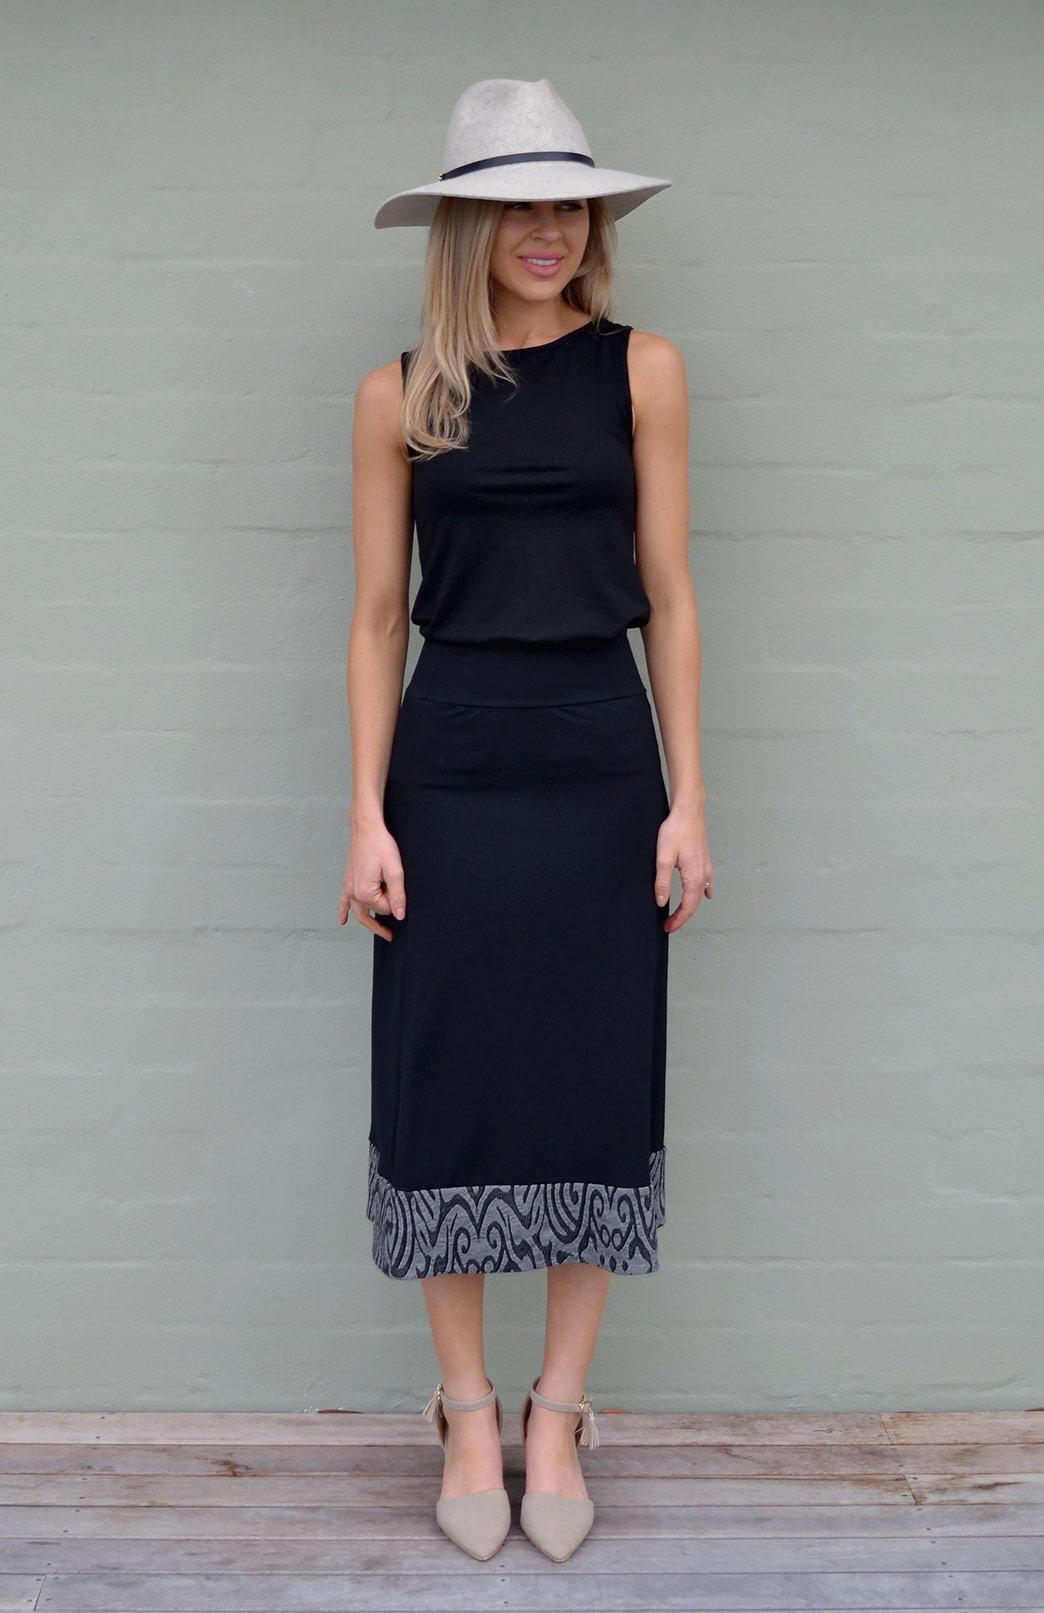 Midi Skirt - Women's Black and Grey A-Line Wool Summer Skirt - Smitten Merino Tasmania Australia